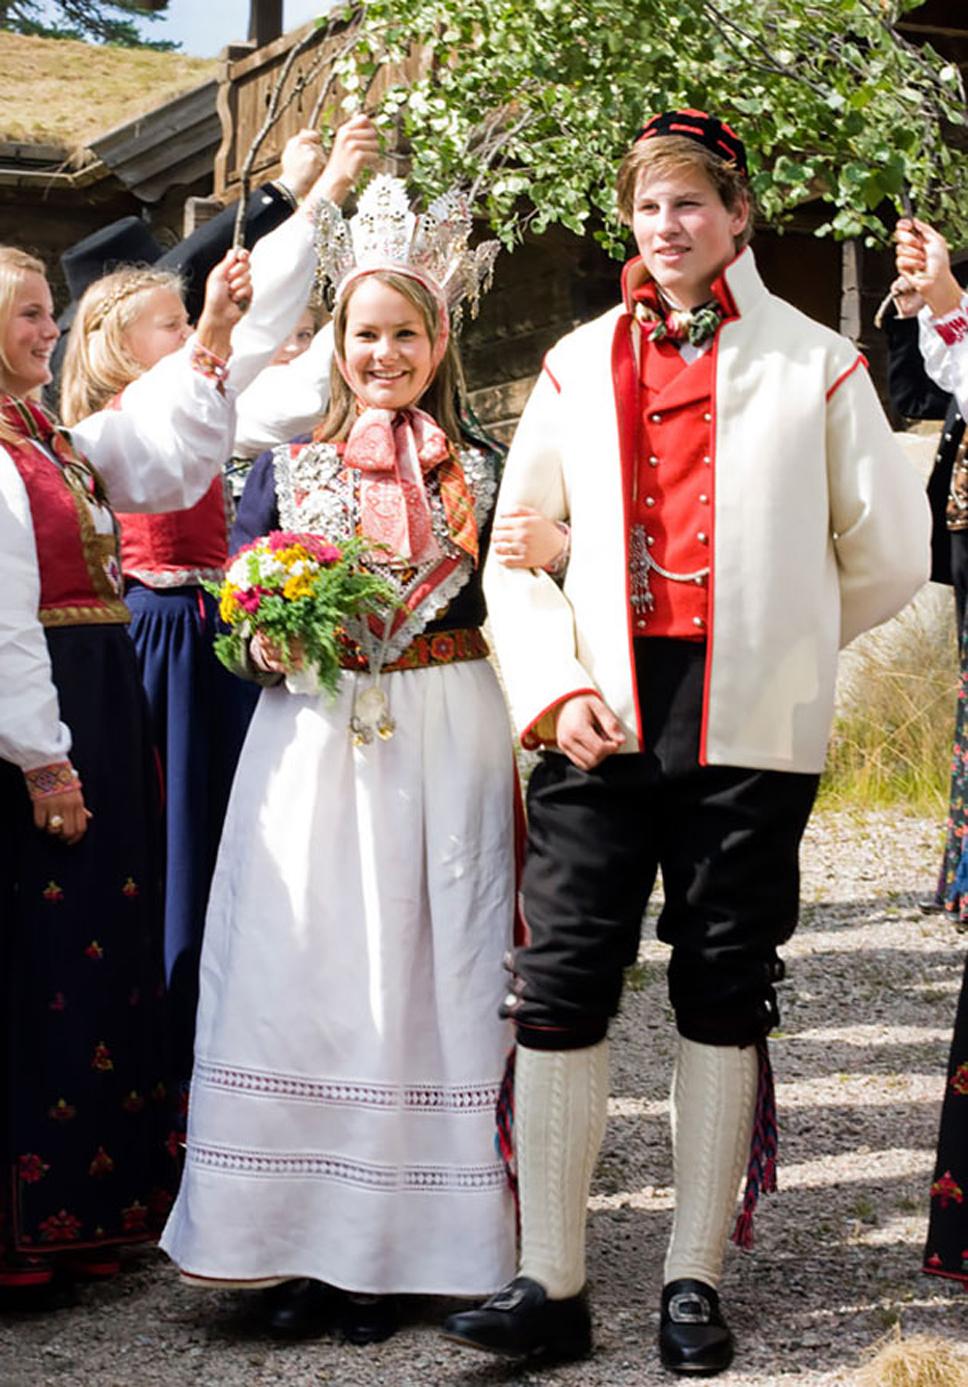 traditional-weddings-around-the-world-241__605